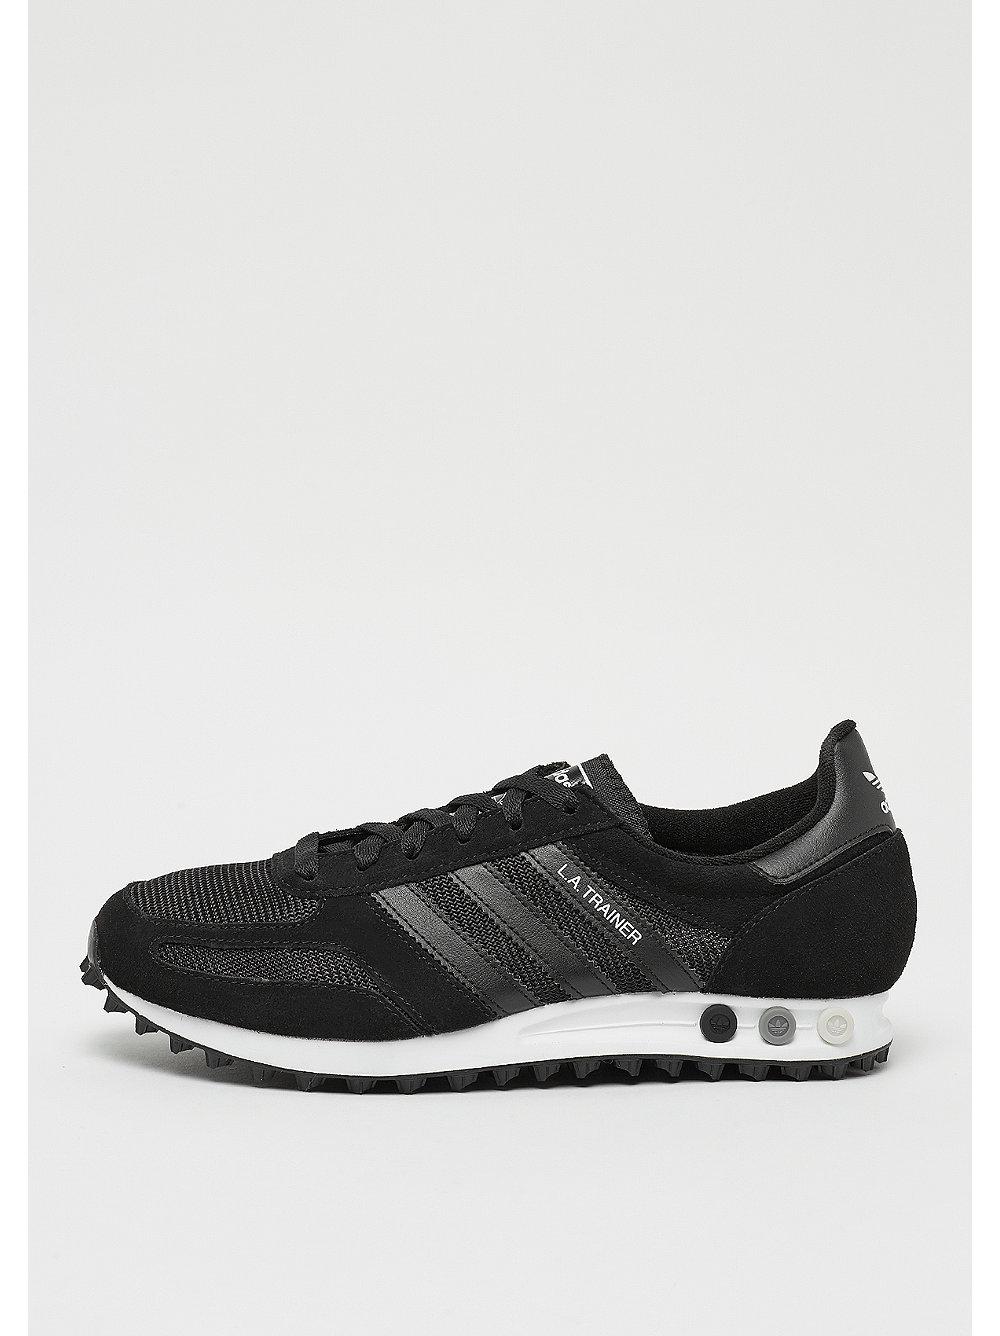 Adidas LA Trainer OG core black